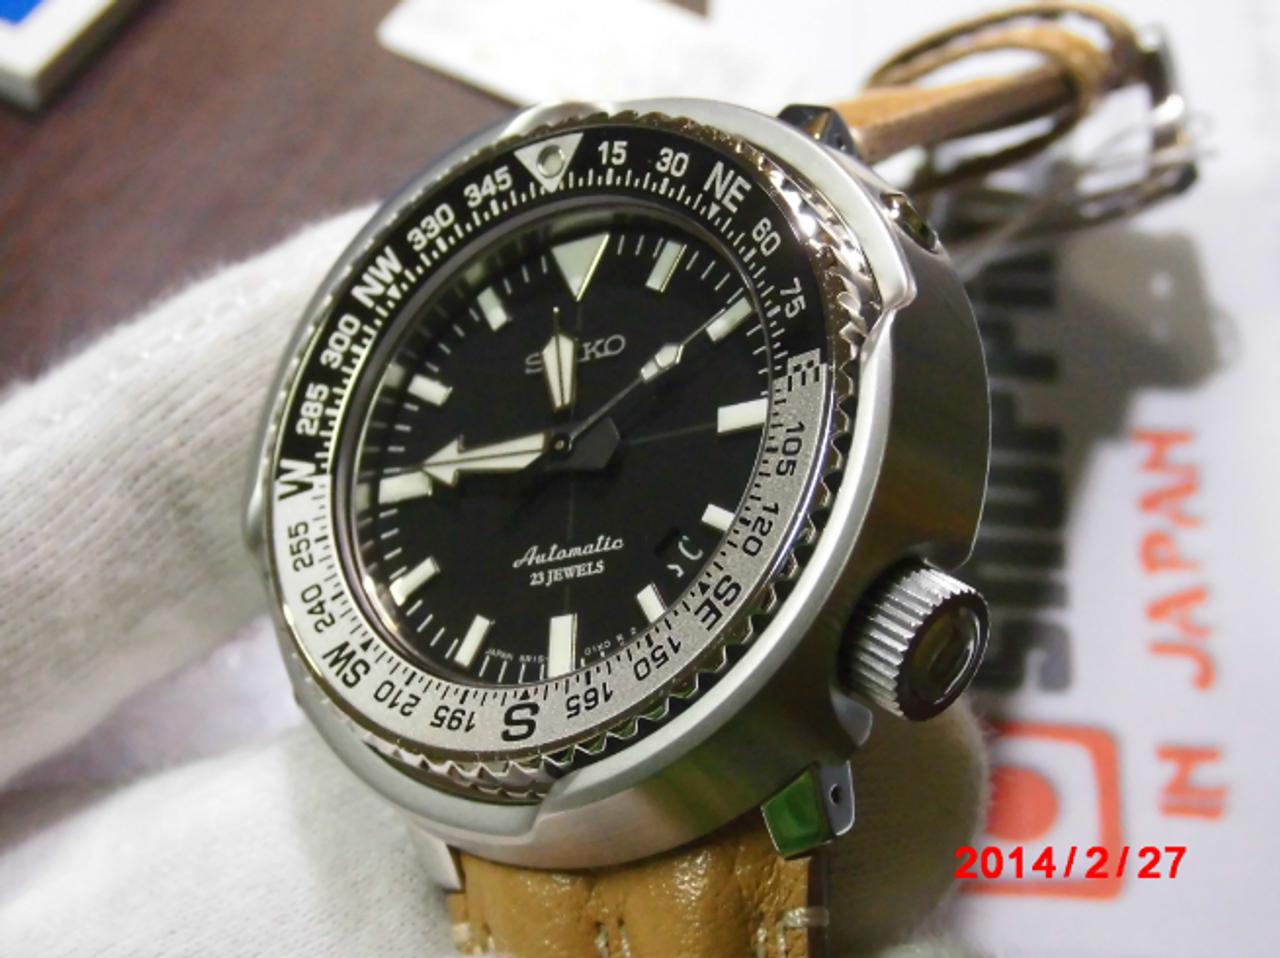 Prospex Fieldmaster SBDC011